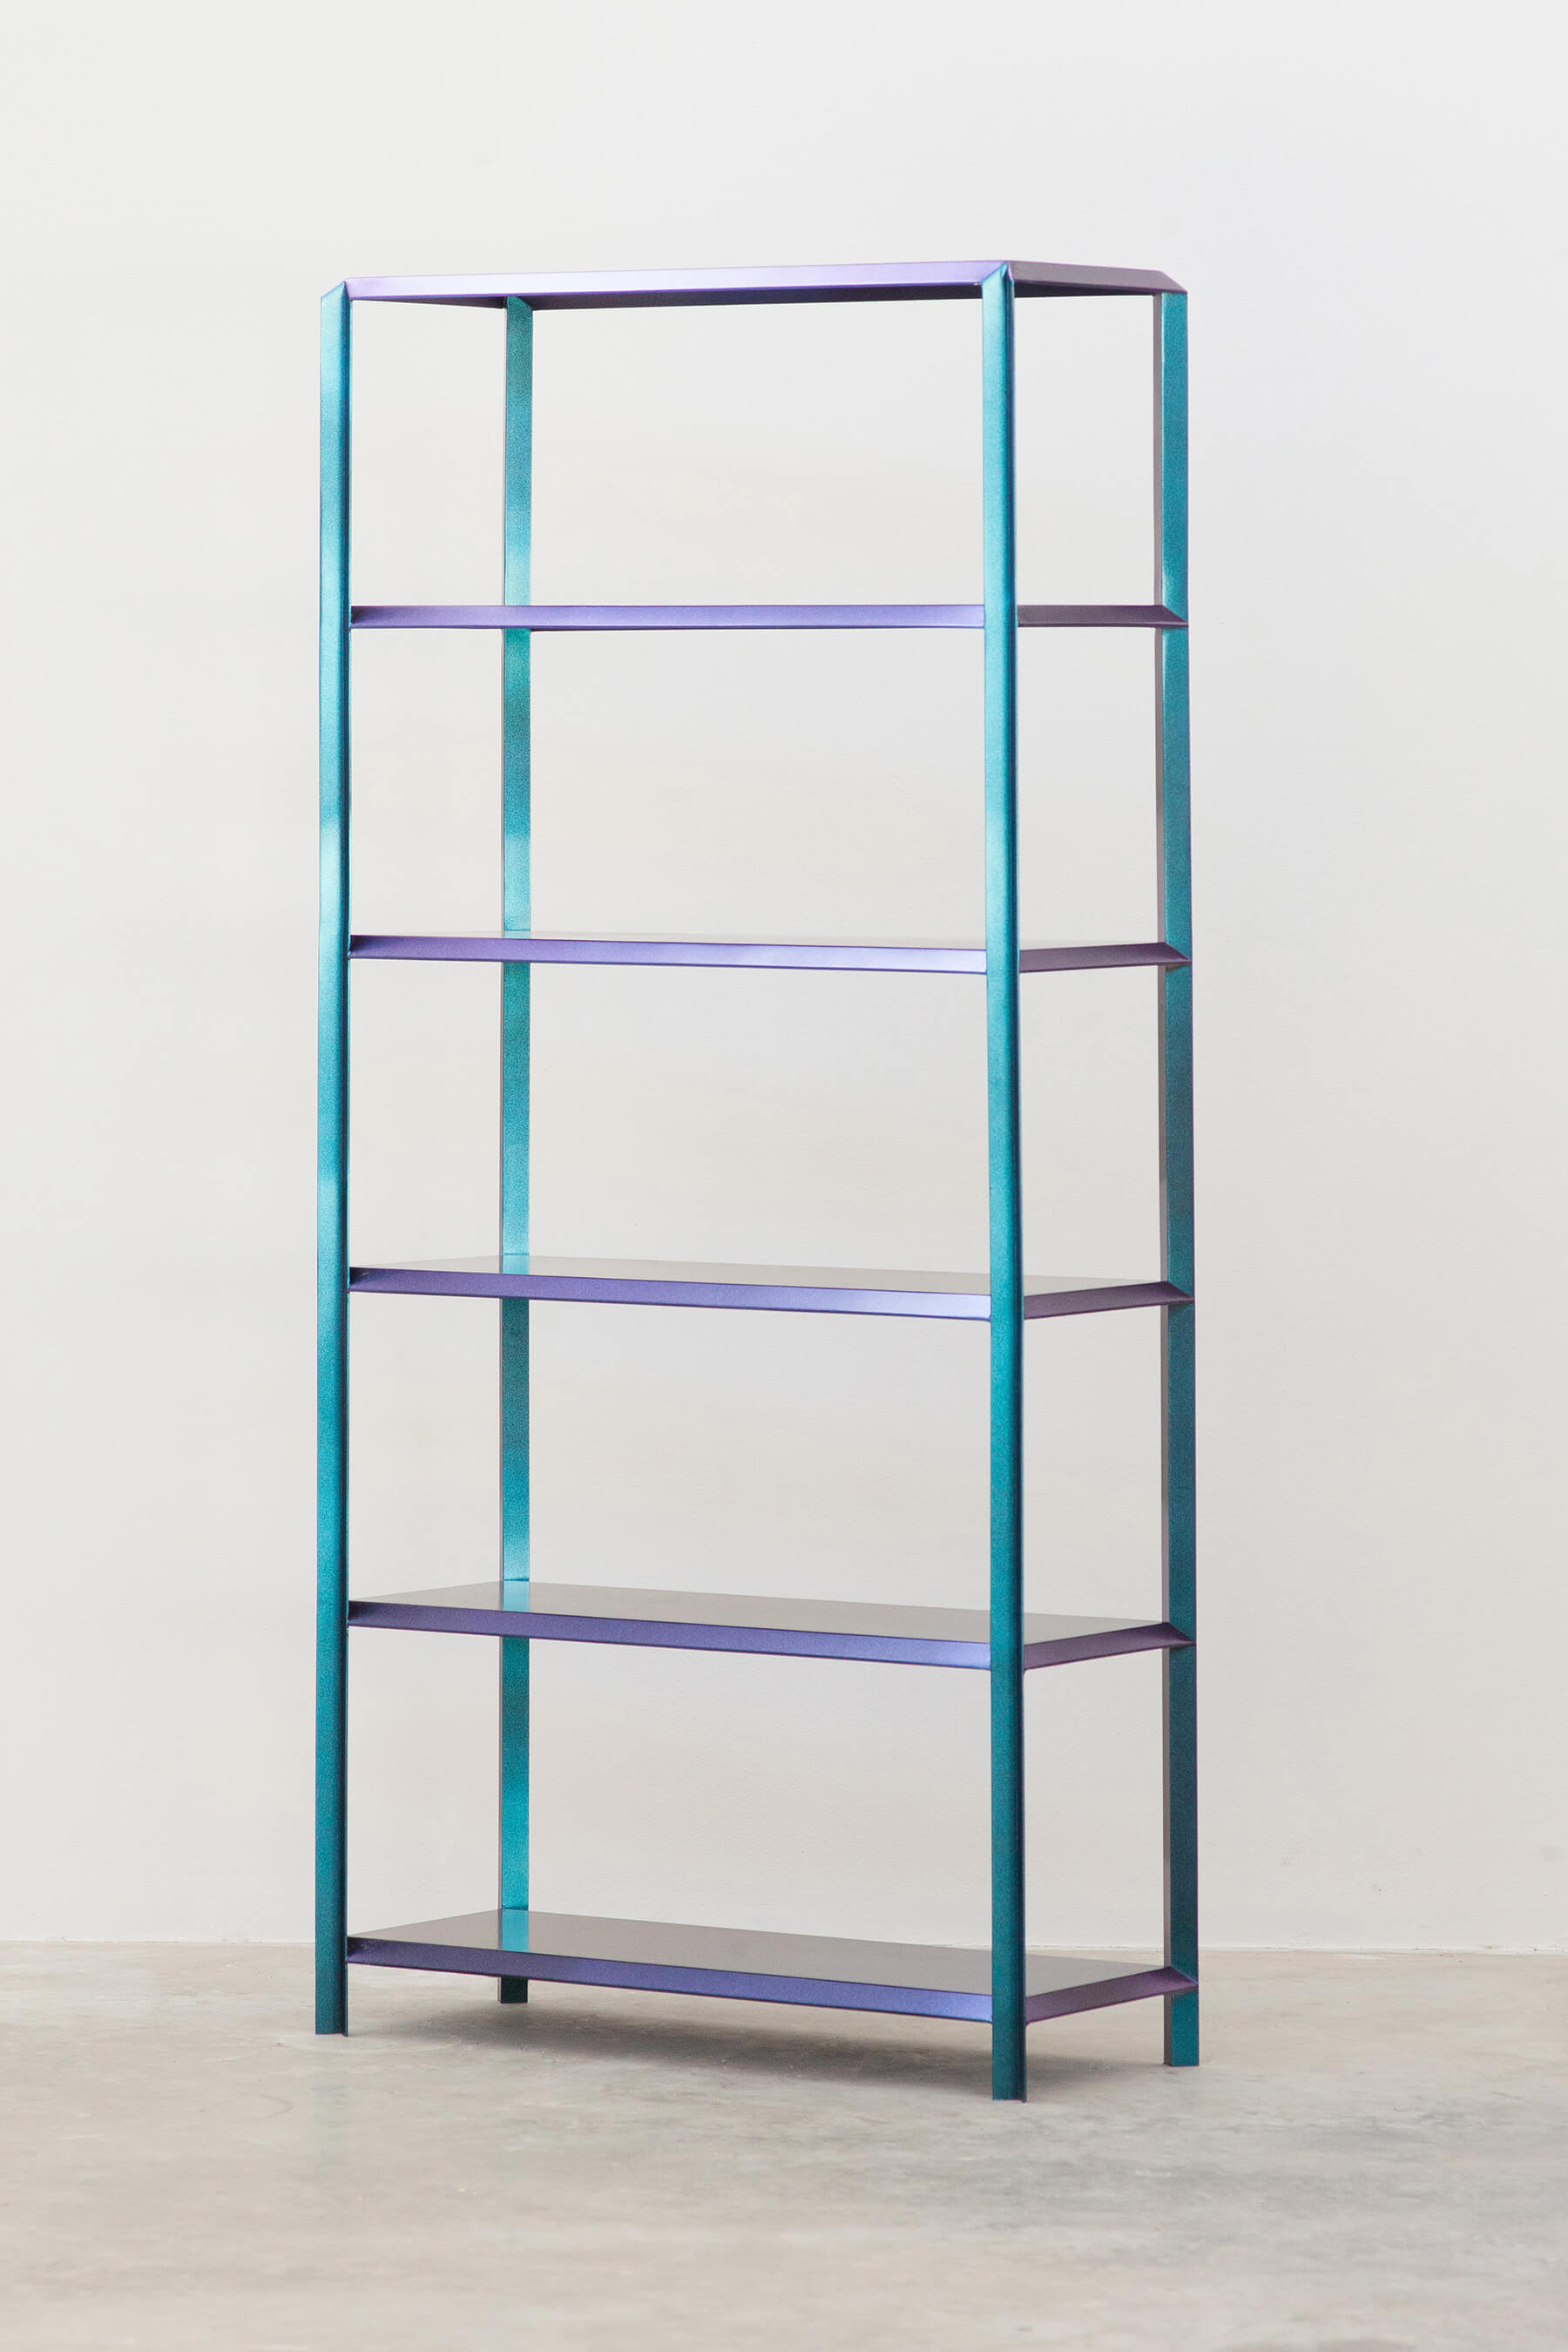 Marco Campardo Elle Collection Brass Bookshelf Wallpaper Design Awards winner for Seeds London Gallery